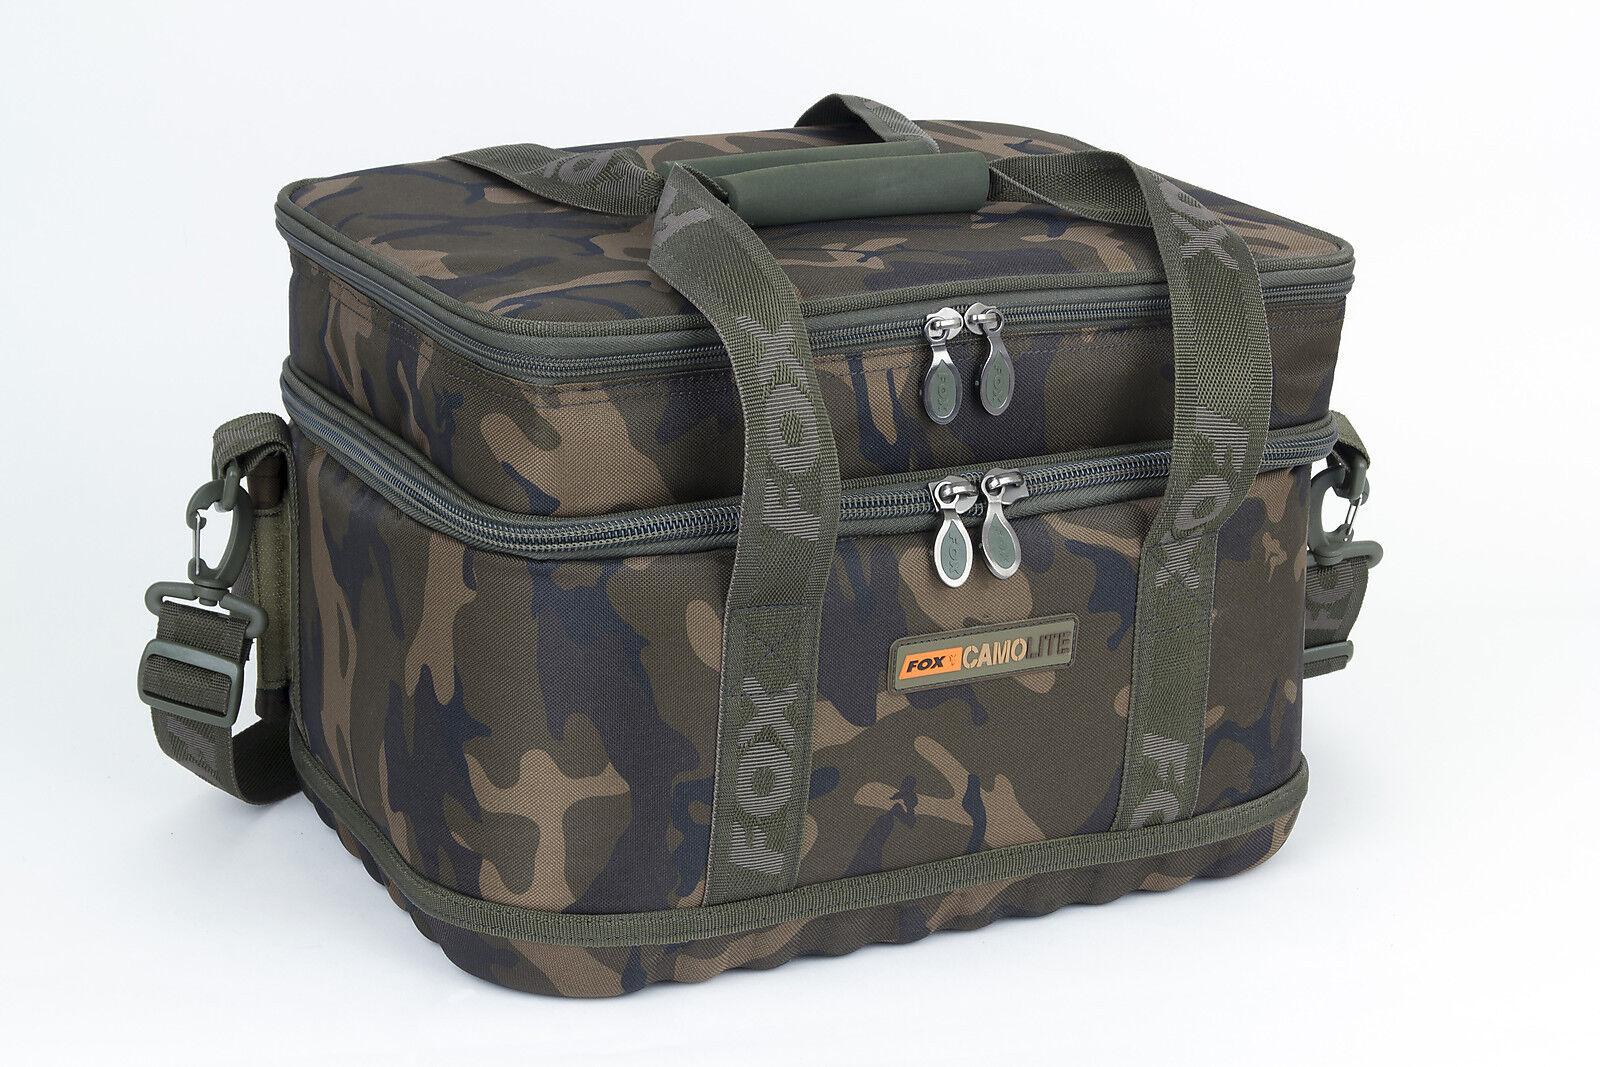 Fox CamoLite Low Level Cool Bag CLU299